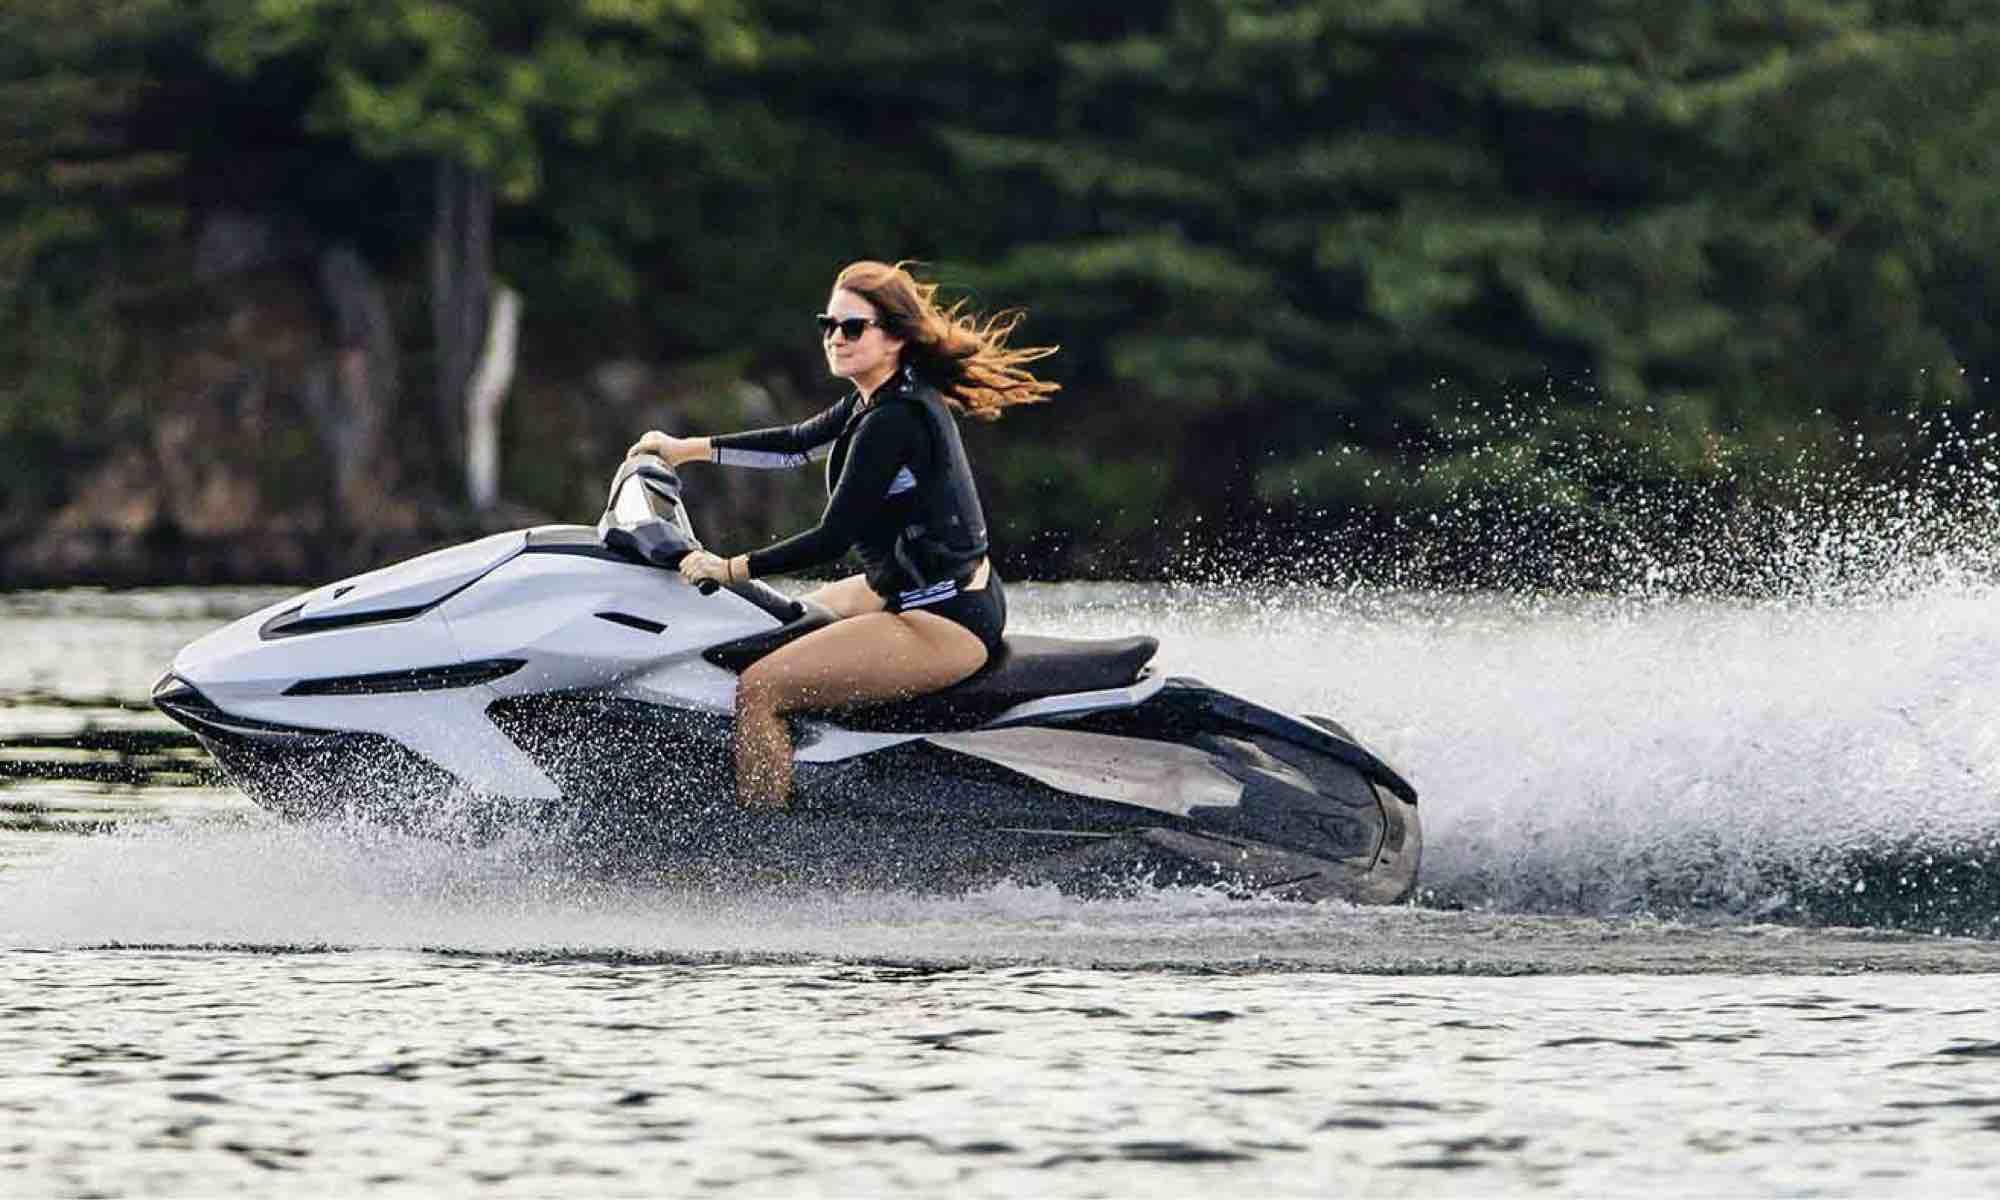 Taiga electric jet ski, made in Montreal